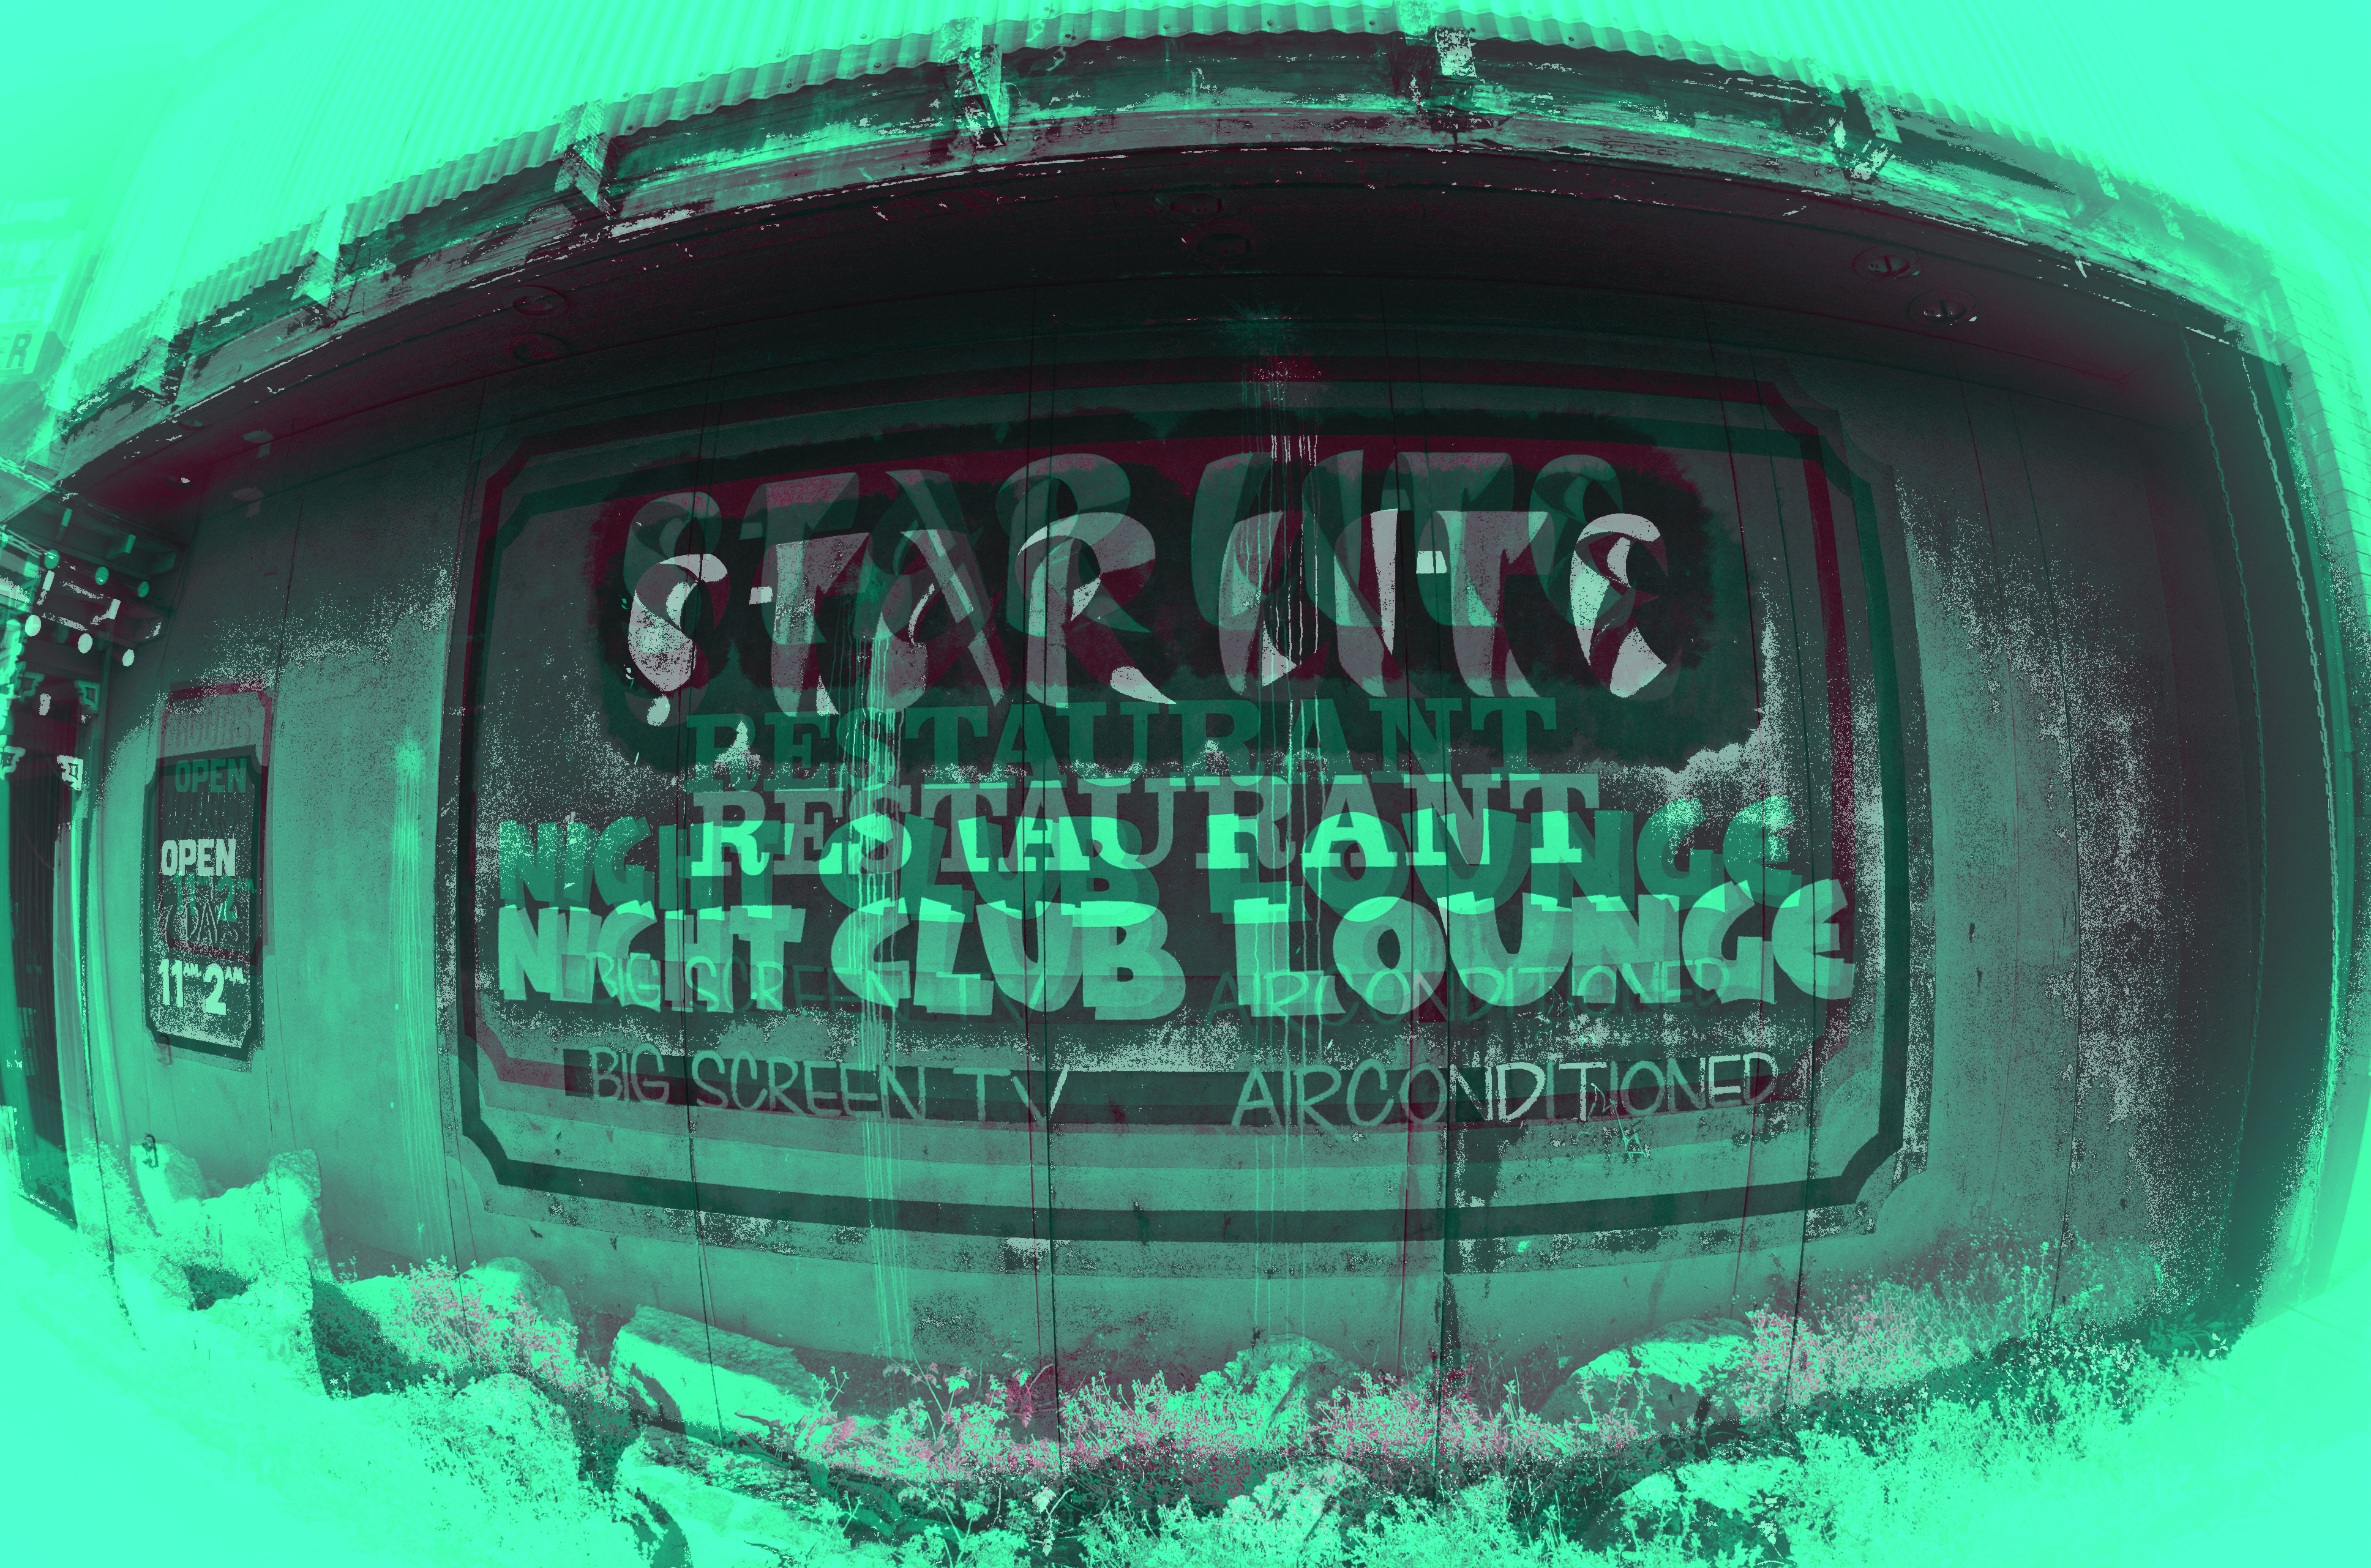 Starlite Nightclub Tacoma, WA